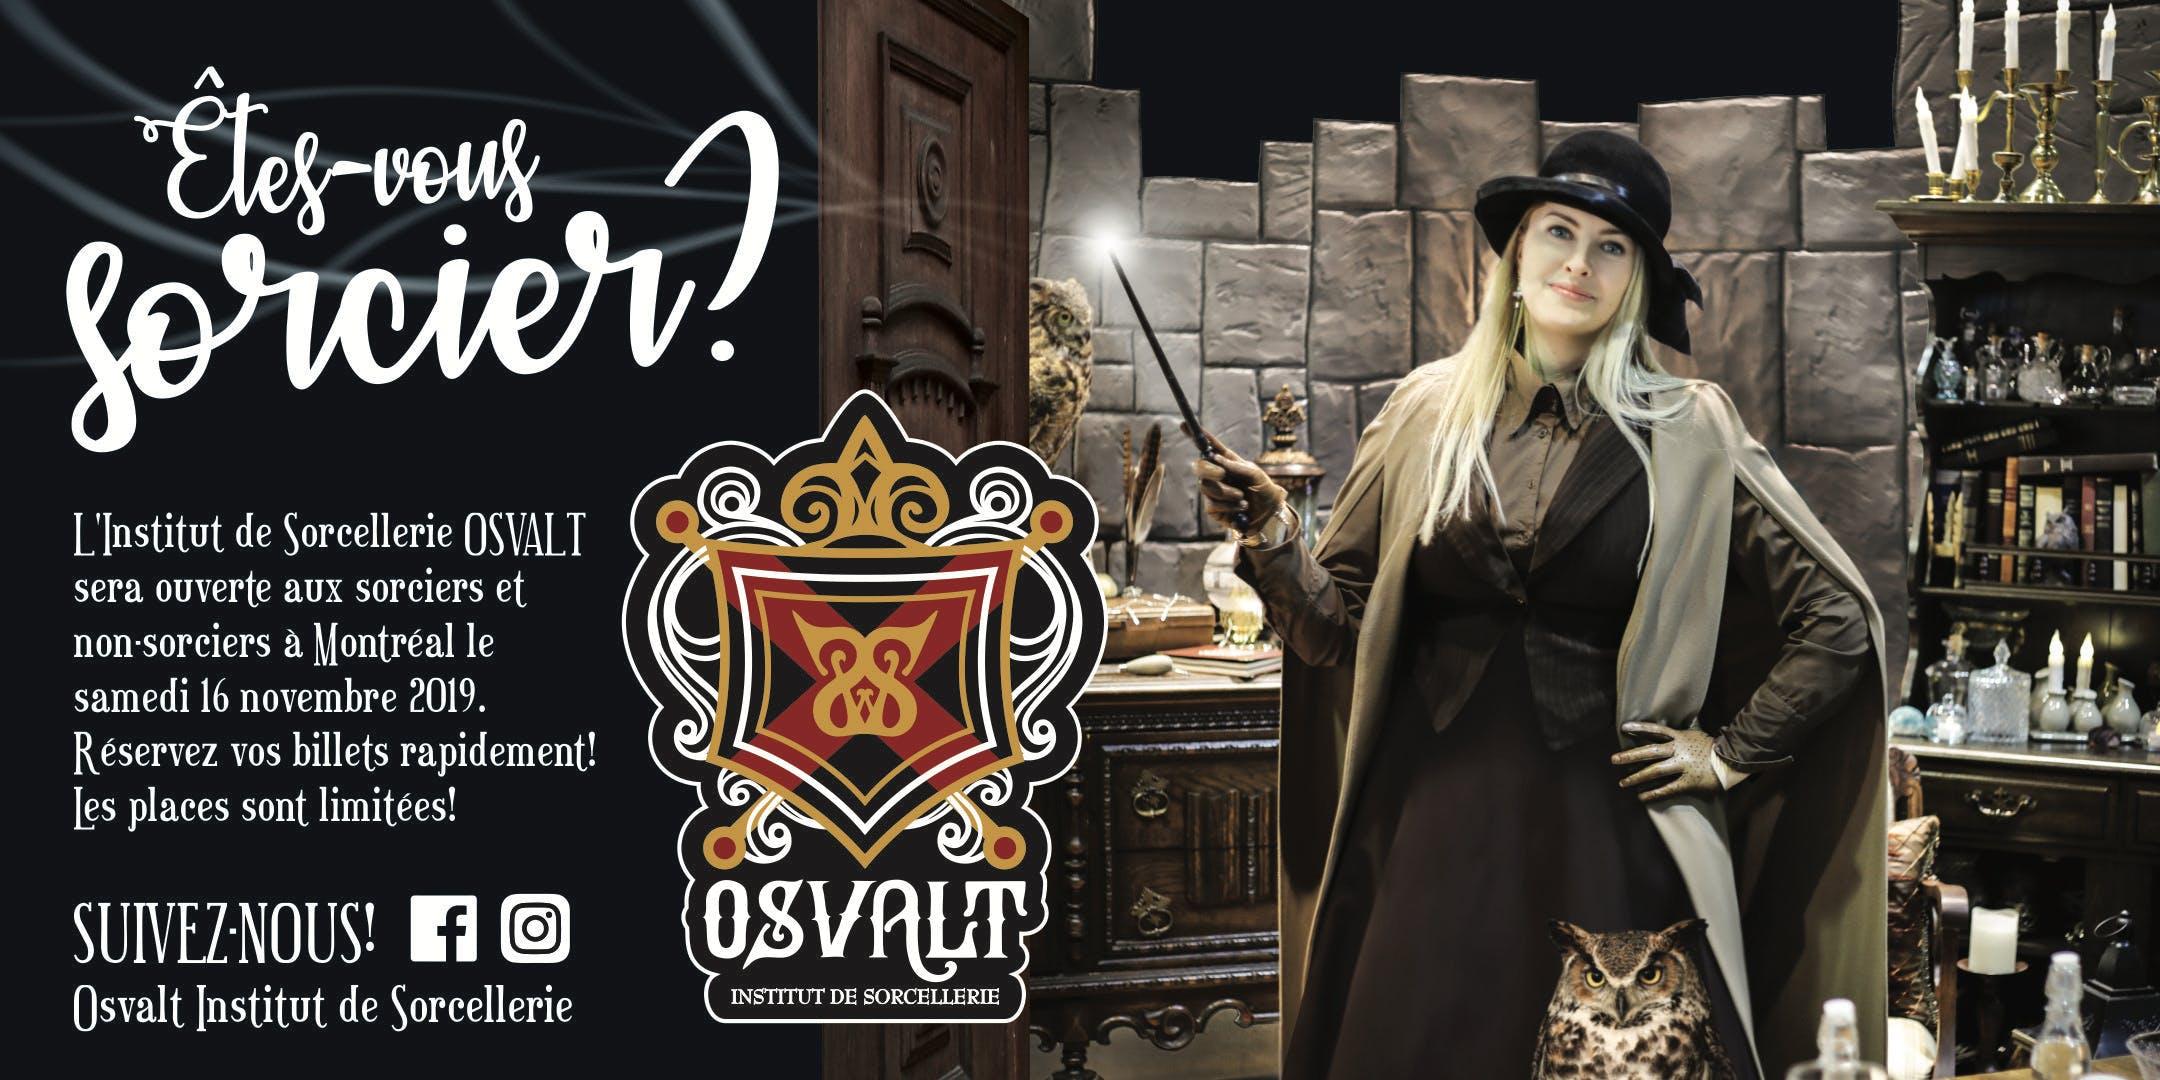 OSVALT - INSTITUT DE SORCELLERIE - Samedi 16 novembre 2019